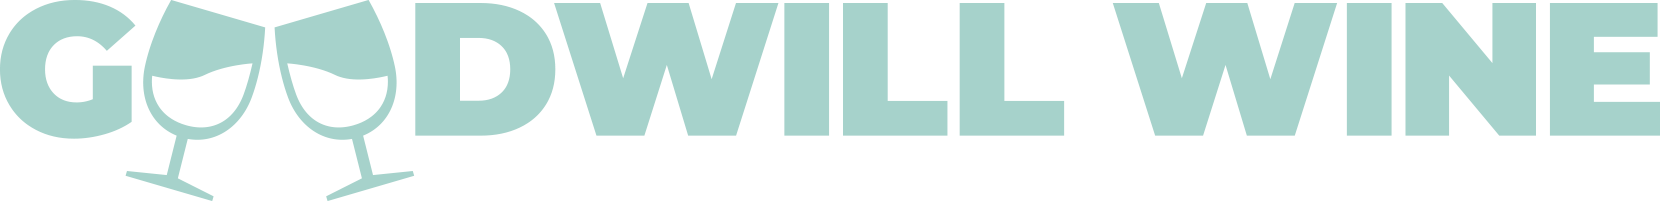 GWWlandscapelogogreen.png